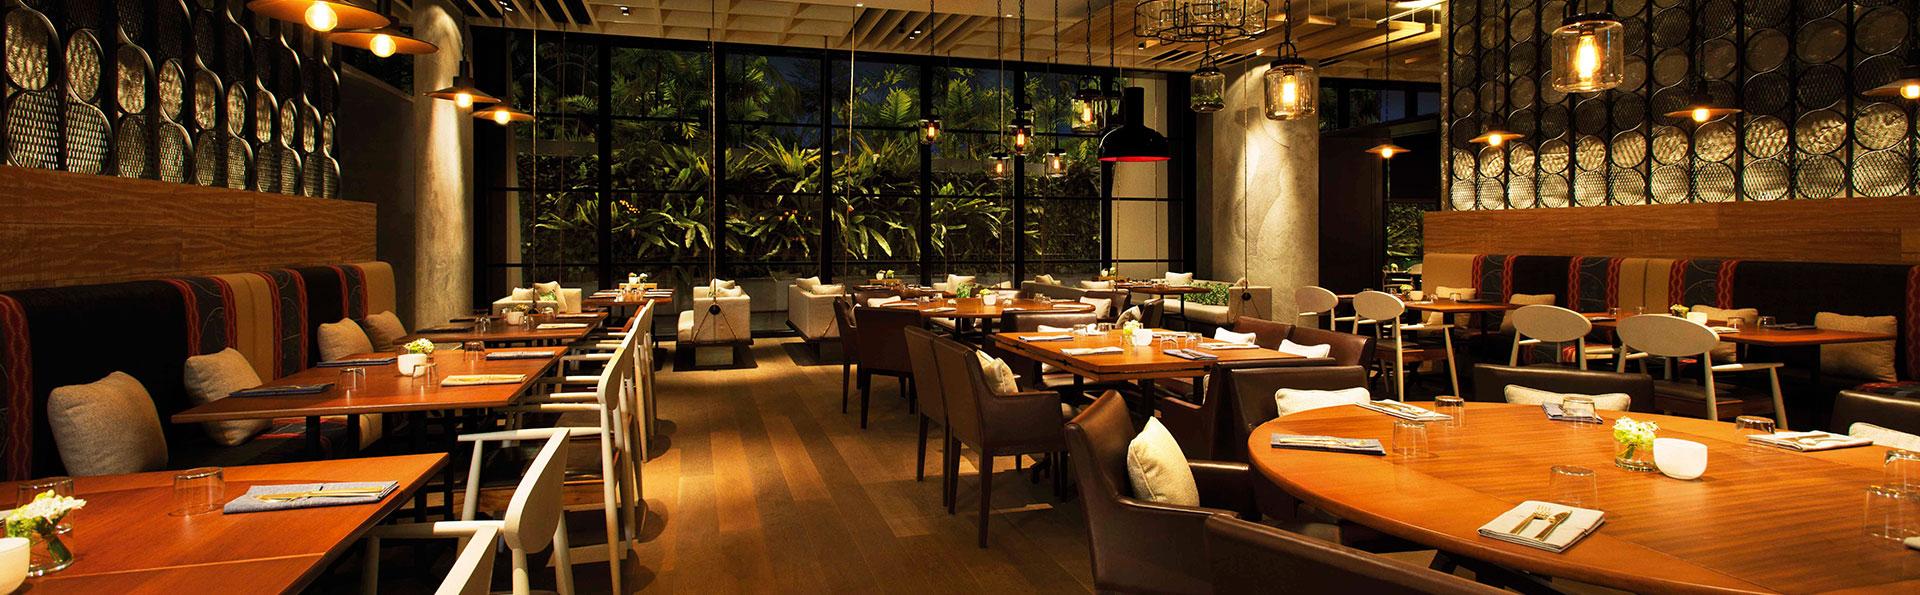 Adrift by David Myers - Celebrity Chef Restaurant in Marina Bay Sands